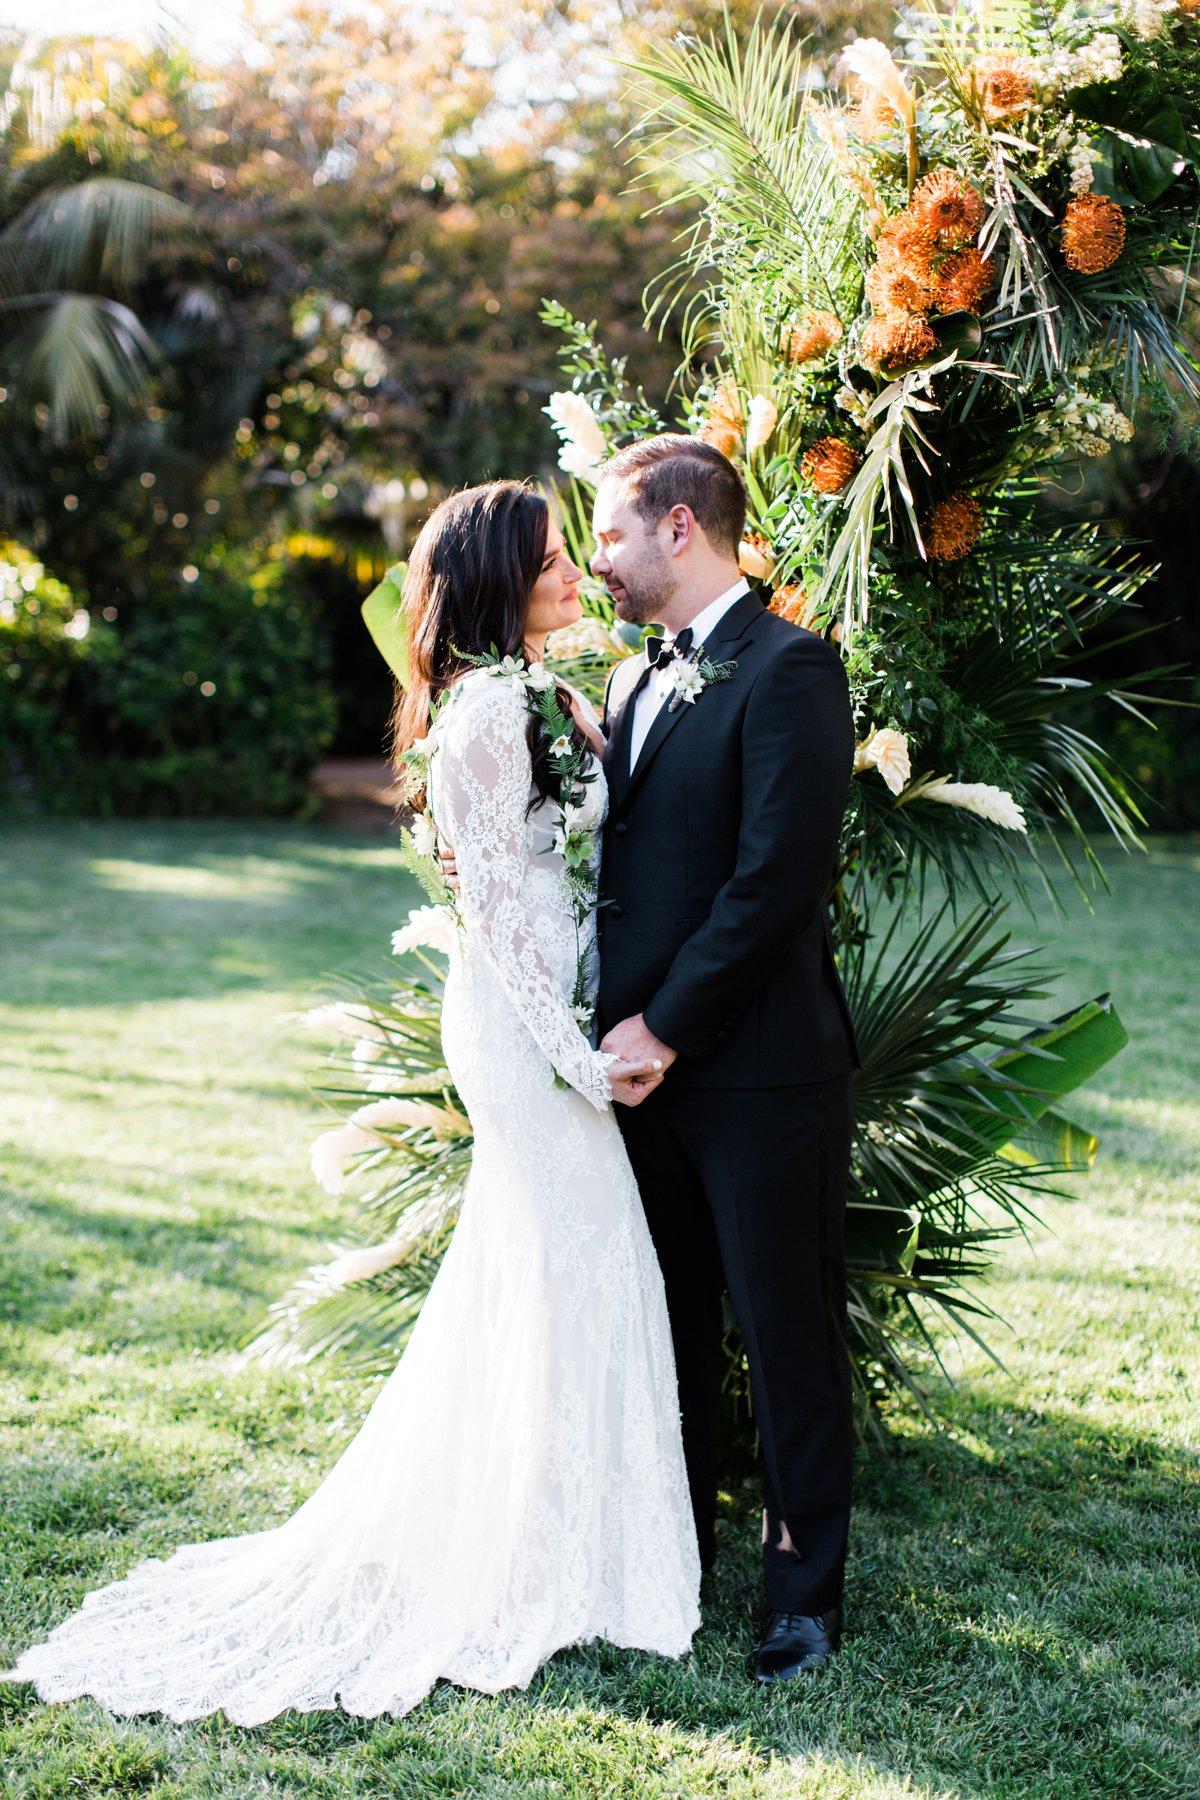 tropical wedding inspiration - photo by Anna Delores https://ruffledblog.com/chic-modern-wedding-at-four-seasons-santa-barbara